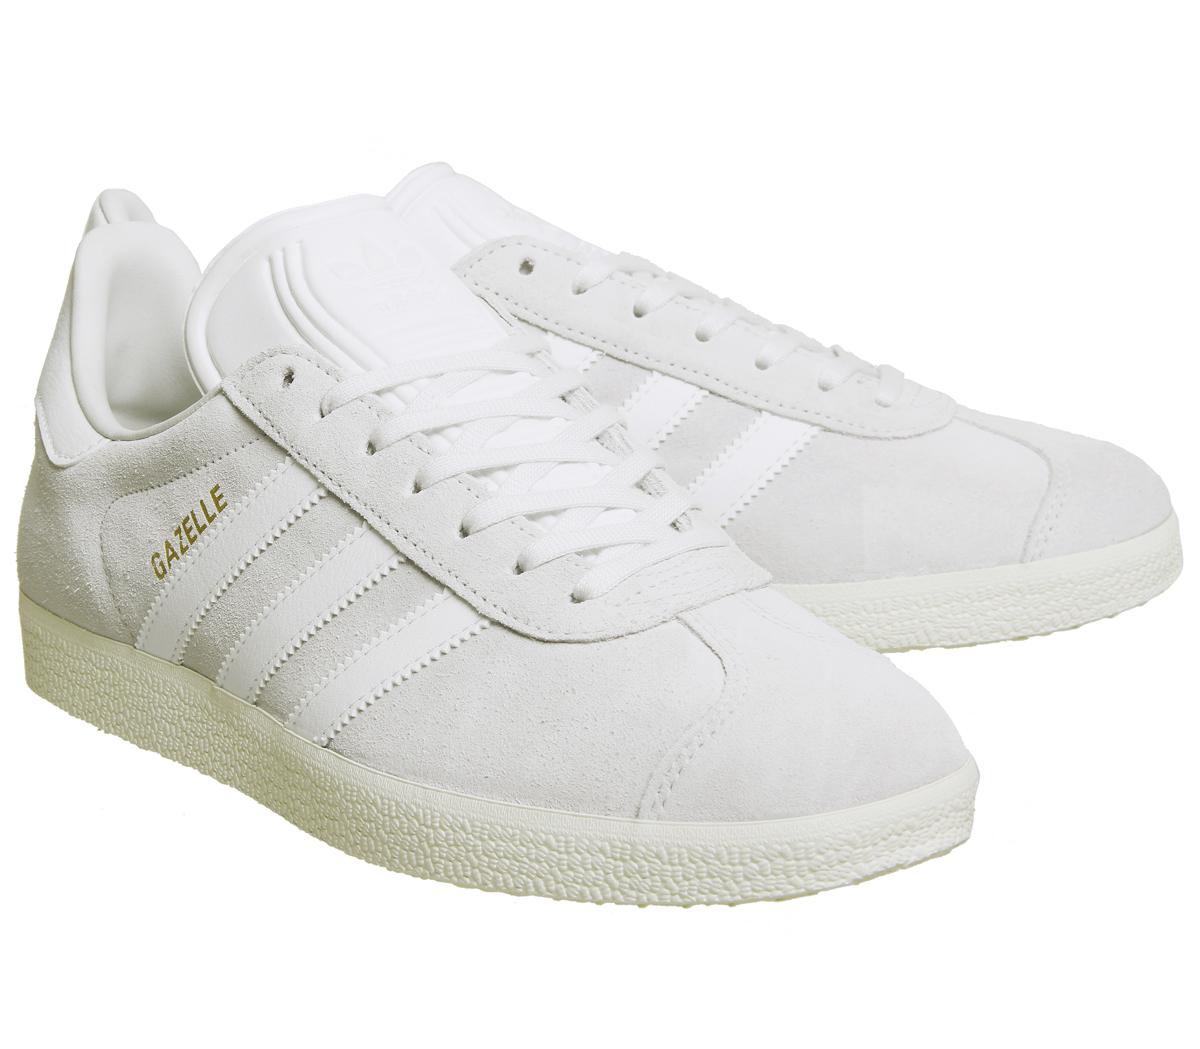 zapatillas gazelle blancas